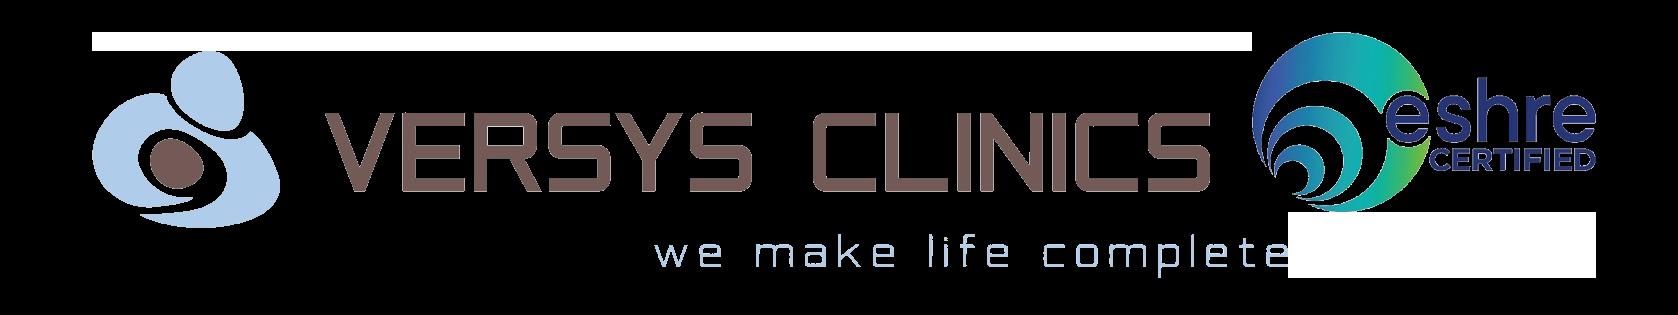 versysclinics.com